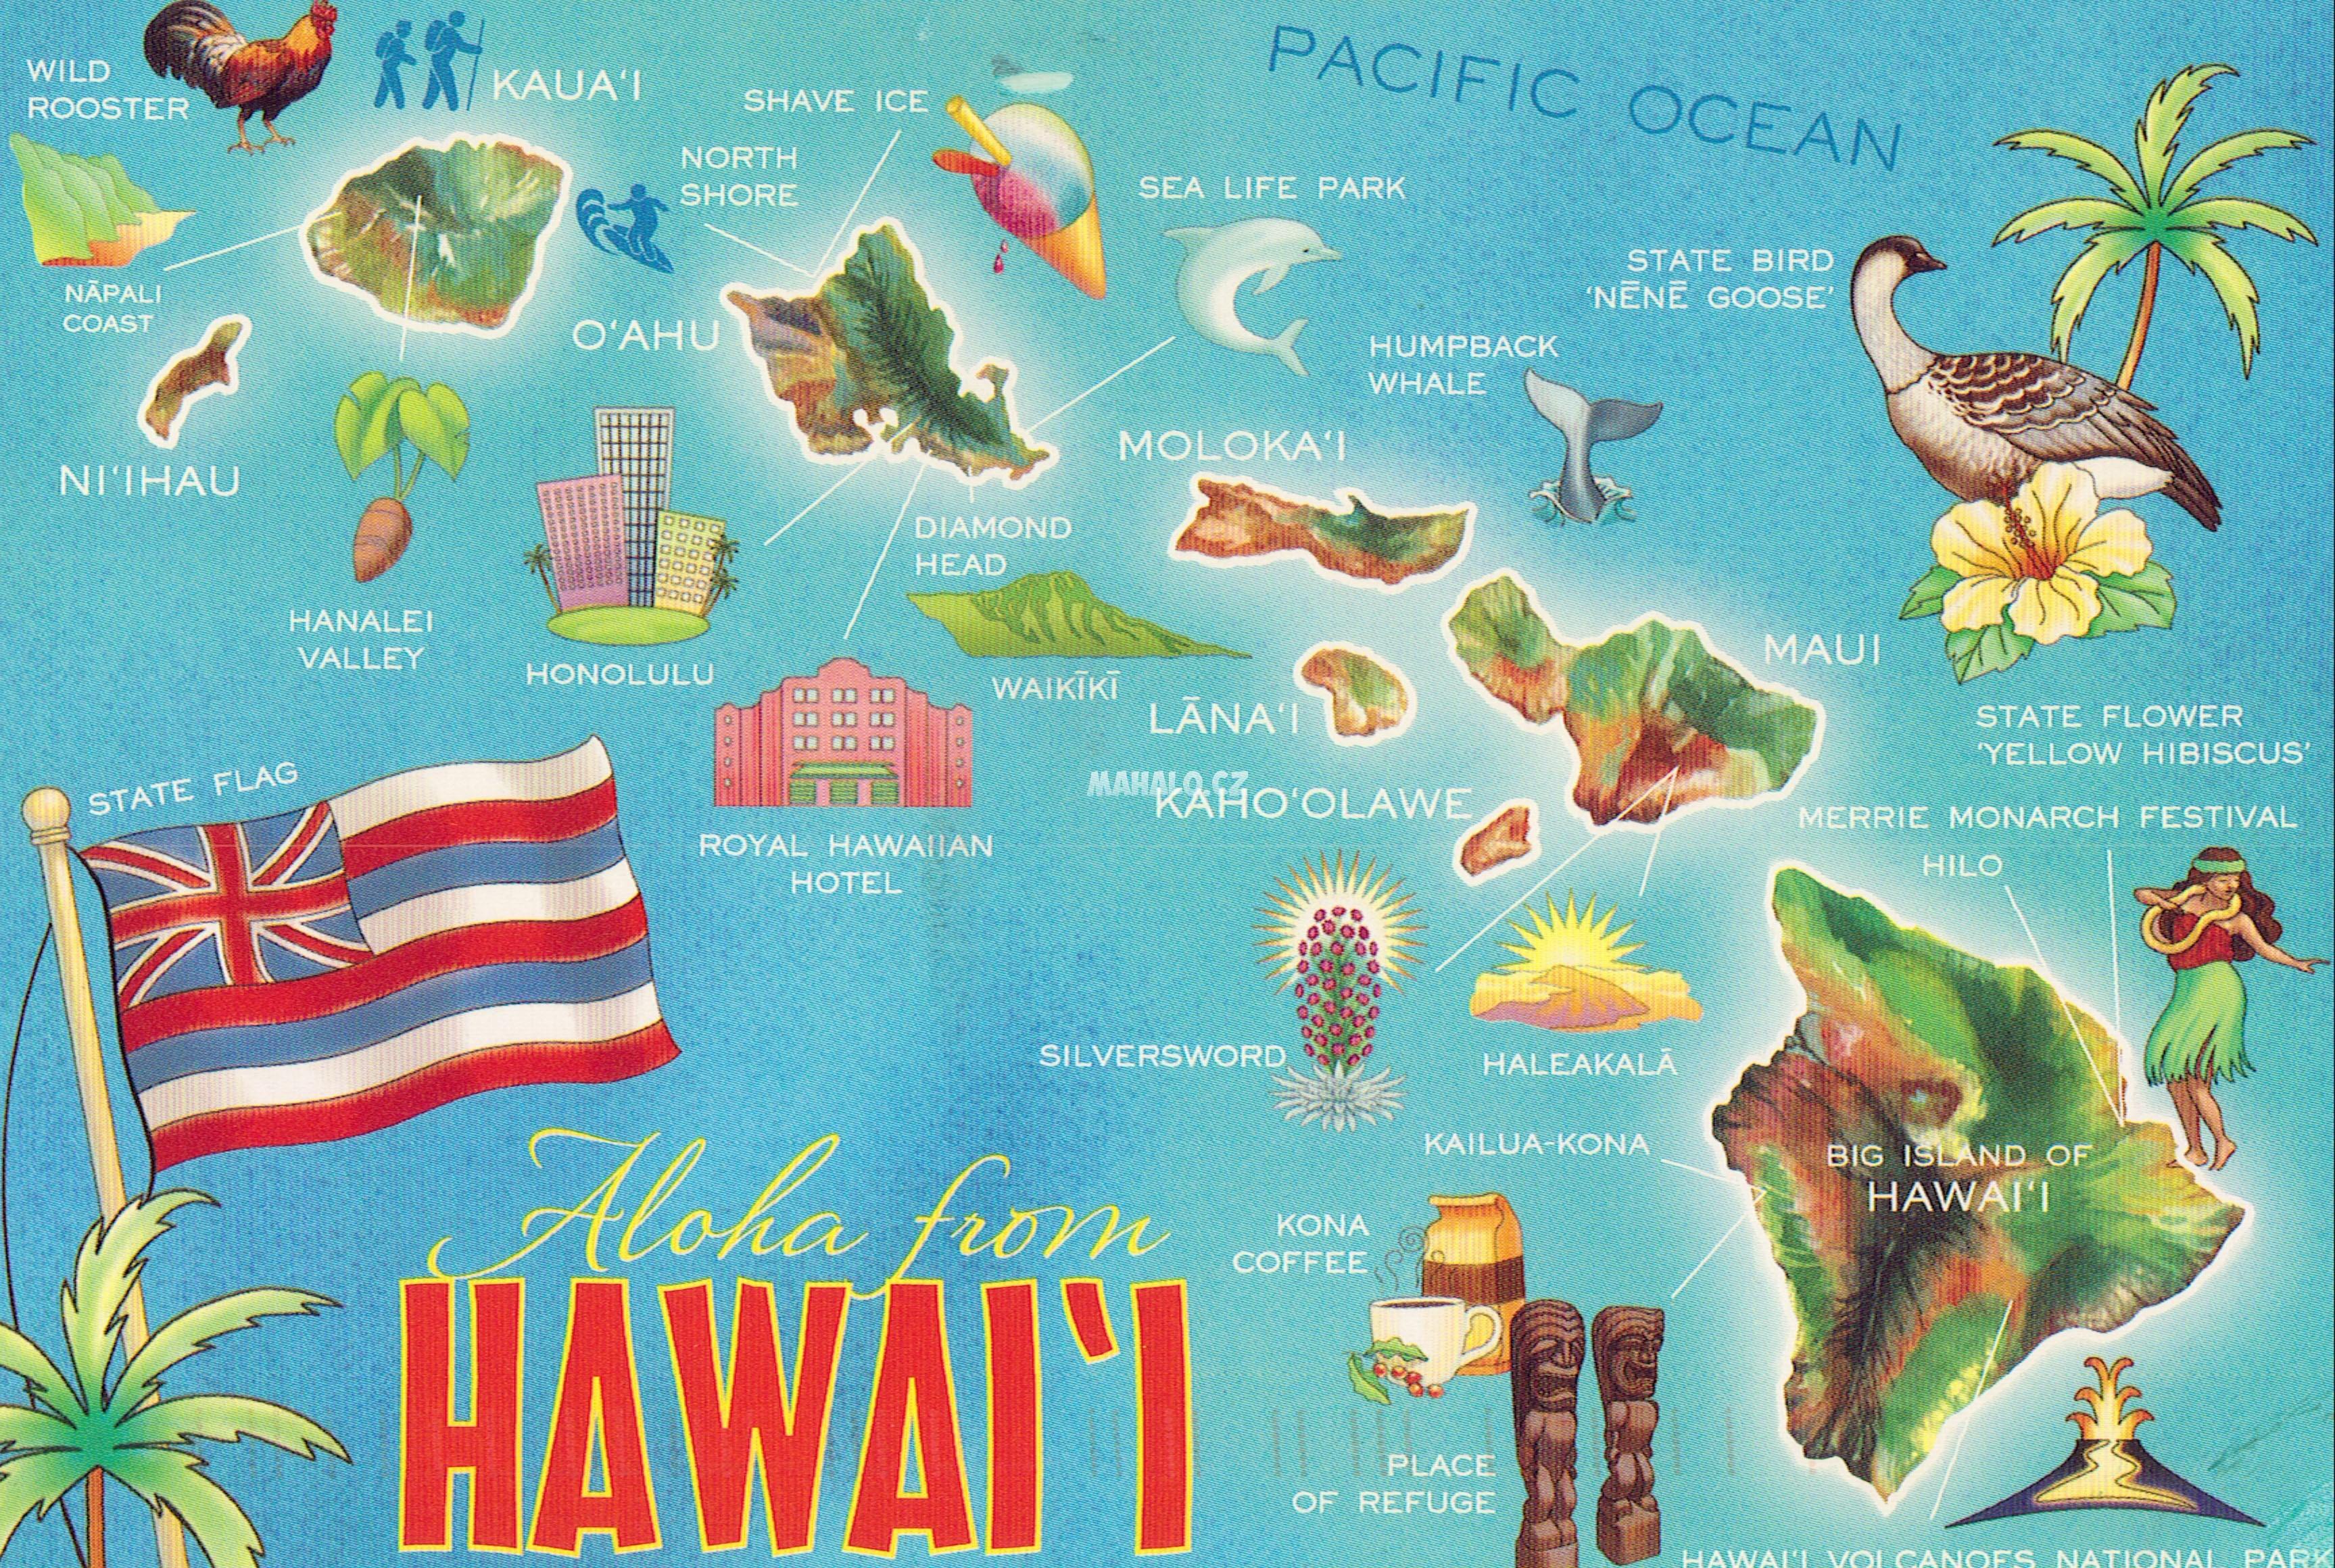 Stahujte Materialy Z Havajskych Ostrovu Havajske Ostrovy Mahalo Cz